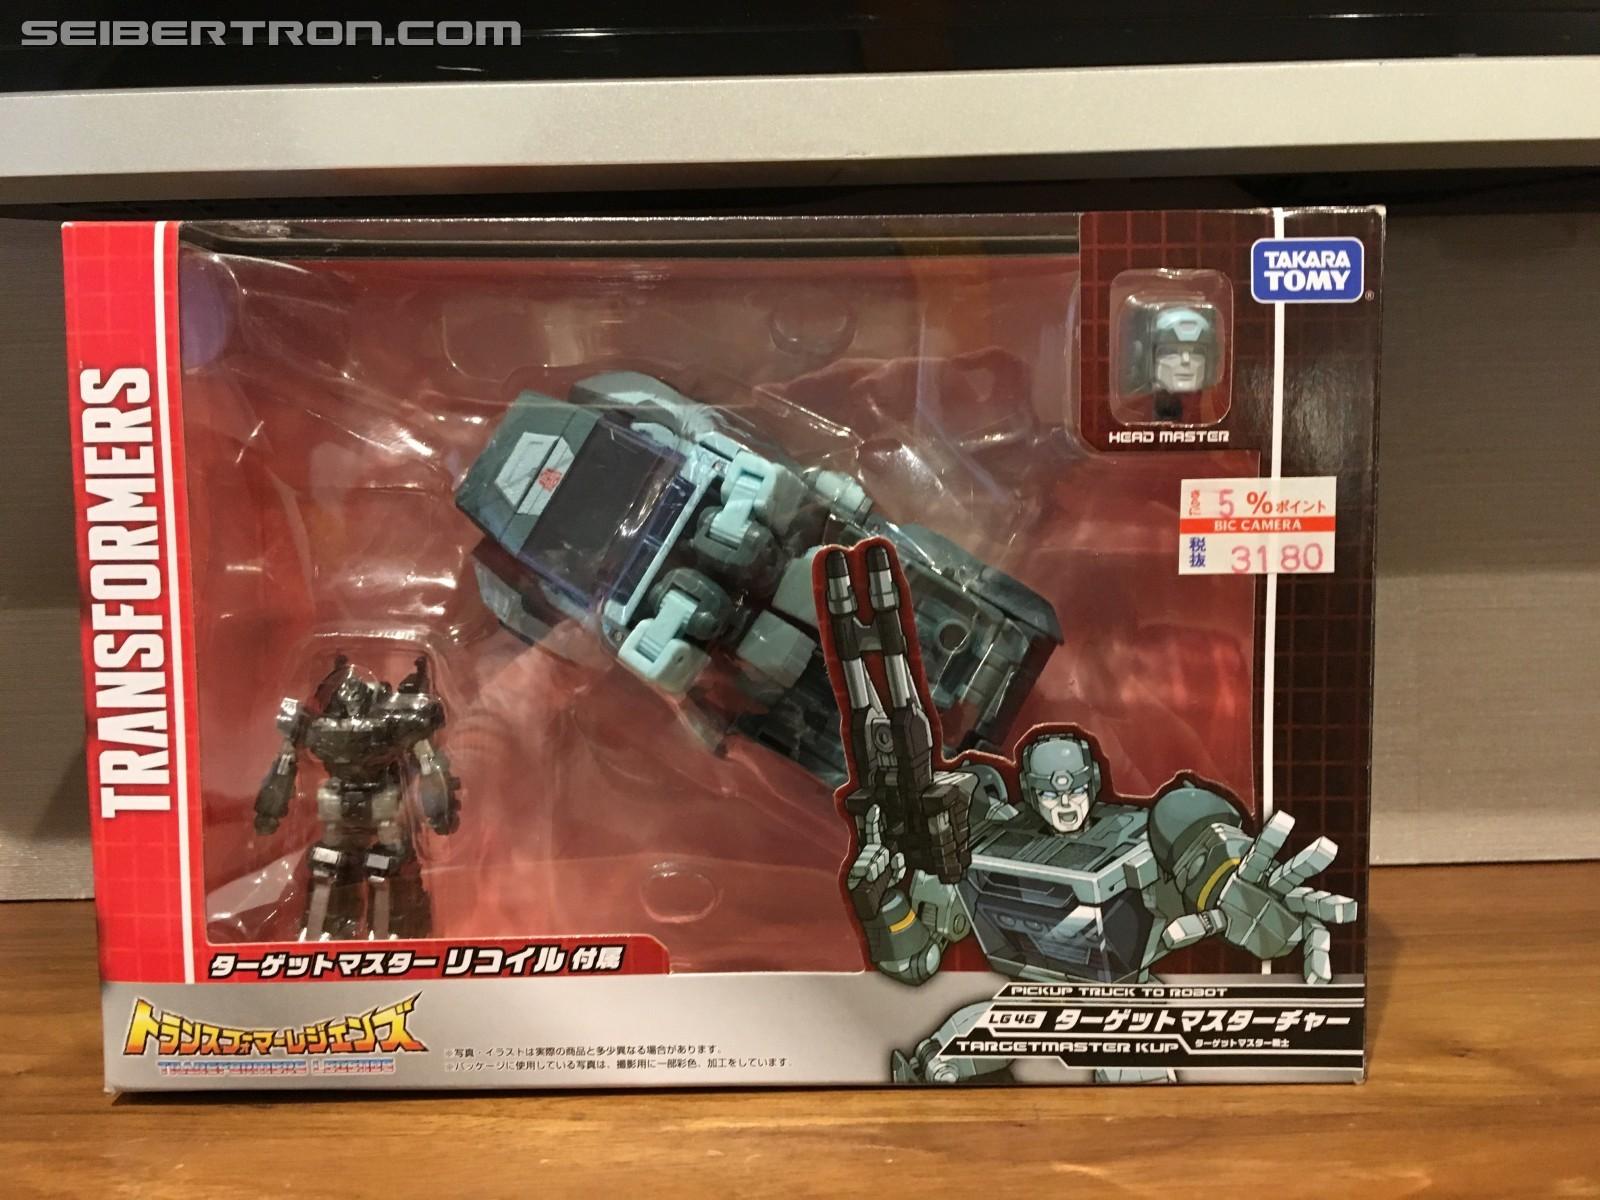 Transformers News: Takara Tomy Transformers Legends LG44 Sharkticon, LG45 Hot Rod, LG46 Kup